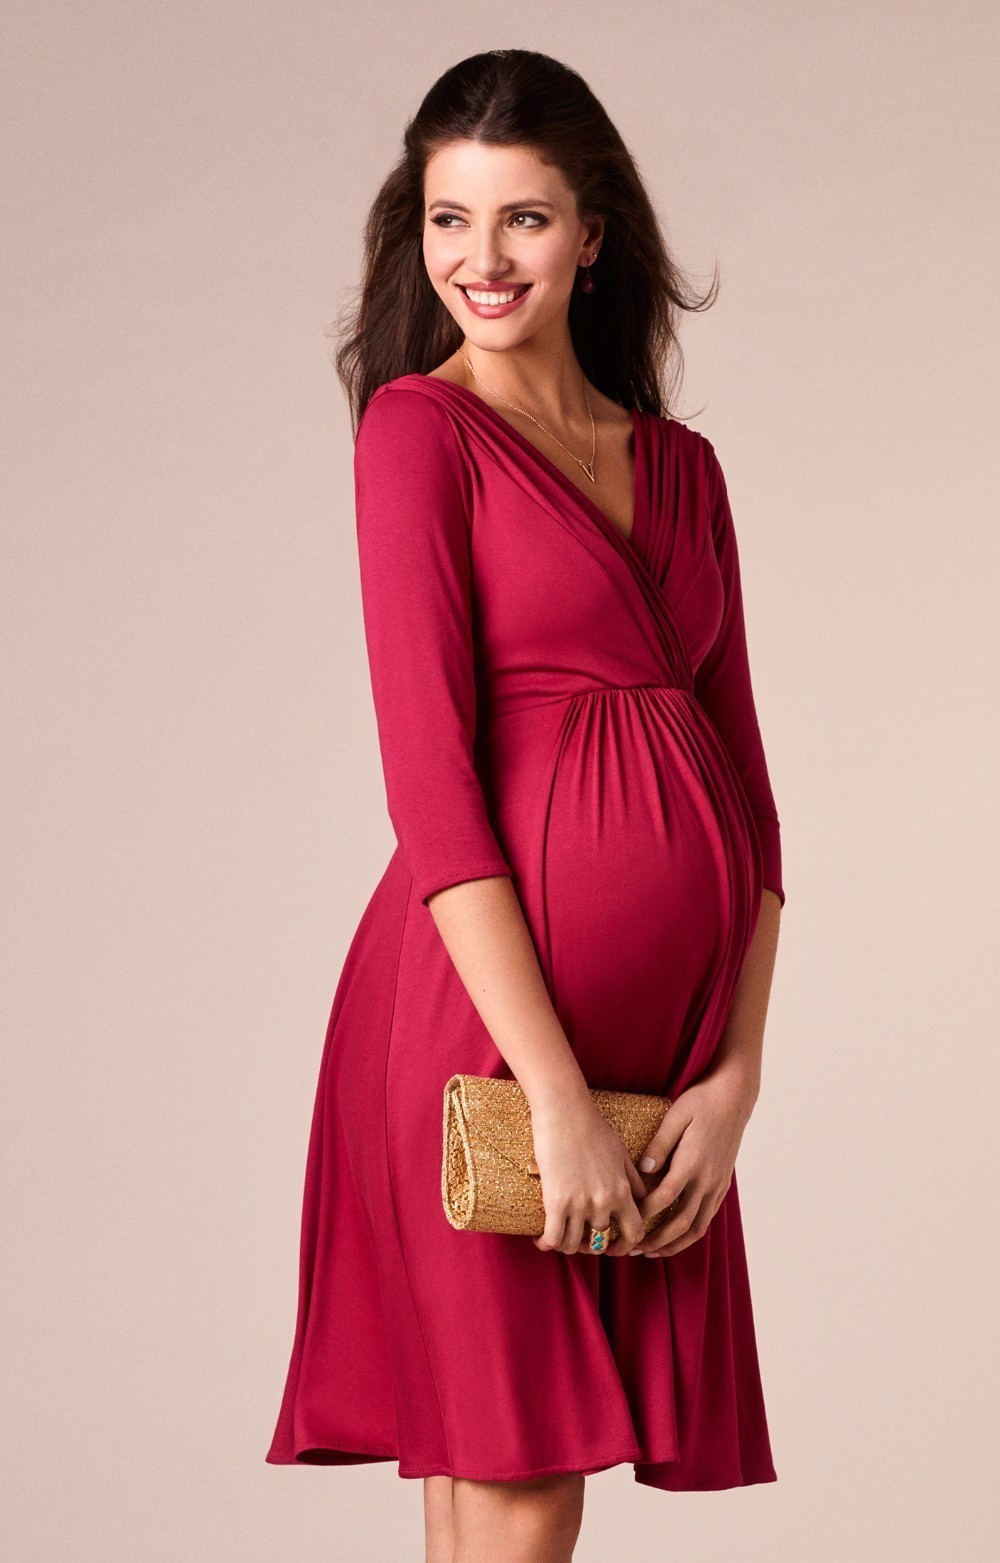 bca755132c969 Enxi Christmas Pregnant Women Evening Party Dress Elegant Summer Lady Dress  Maternity Clothes Plus Size V-neck Maternity Dresses Y19051804